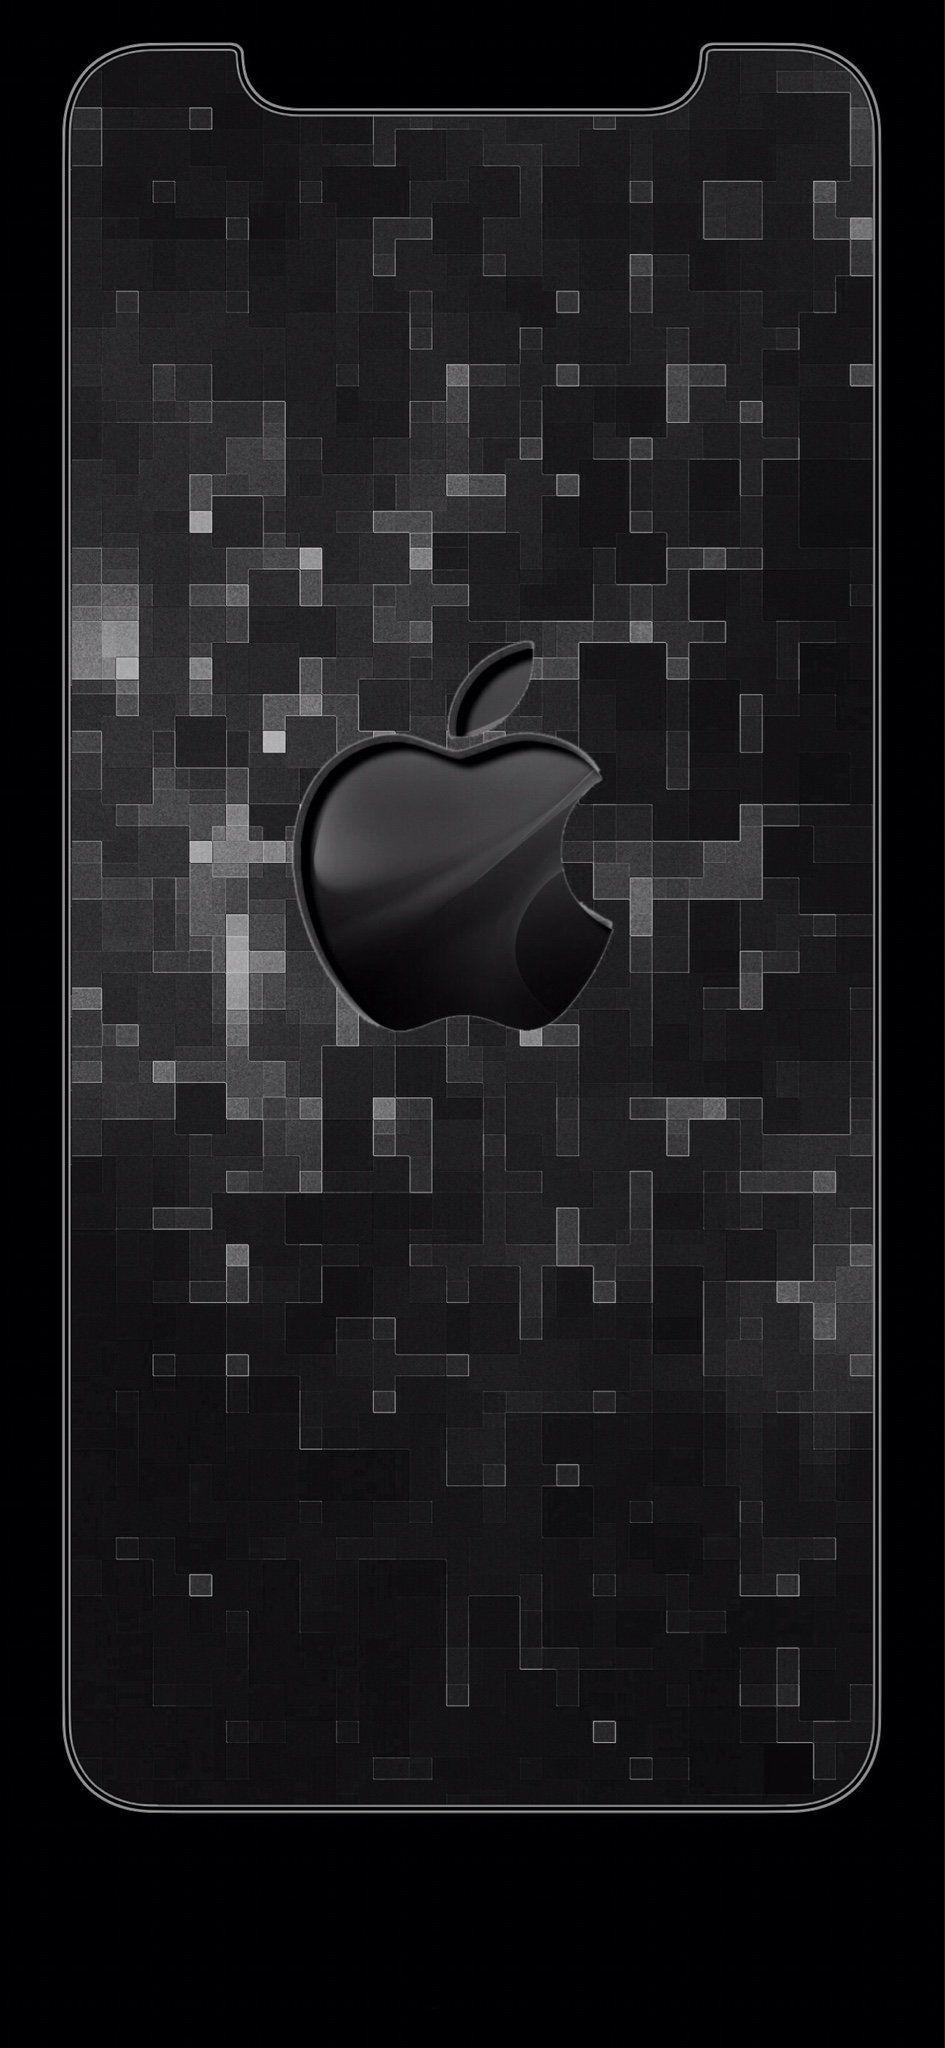 Pin By Deon Van Der Merwe On Iphone X Wallpaper Pretty Wallpaper